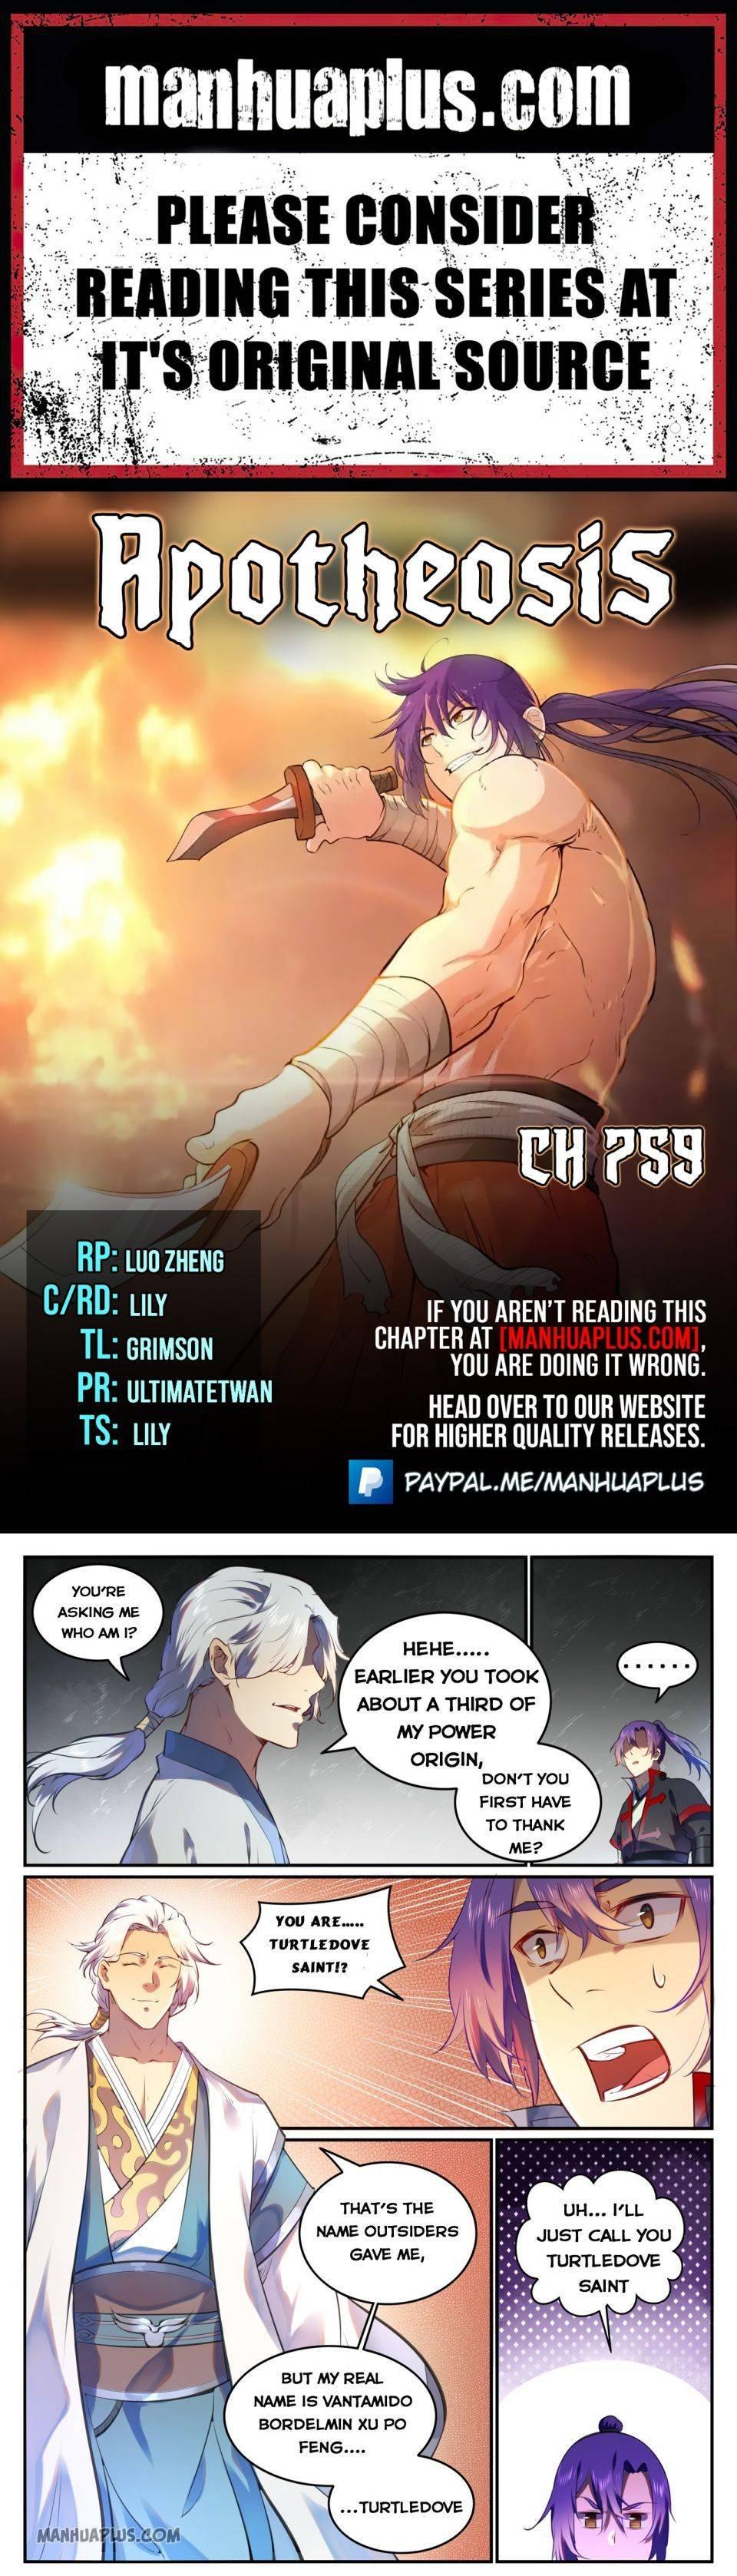 Manga Apotheosis - Chapter 759 Page 1